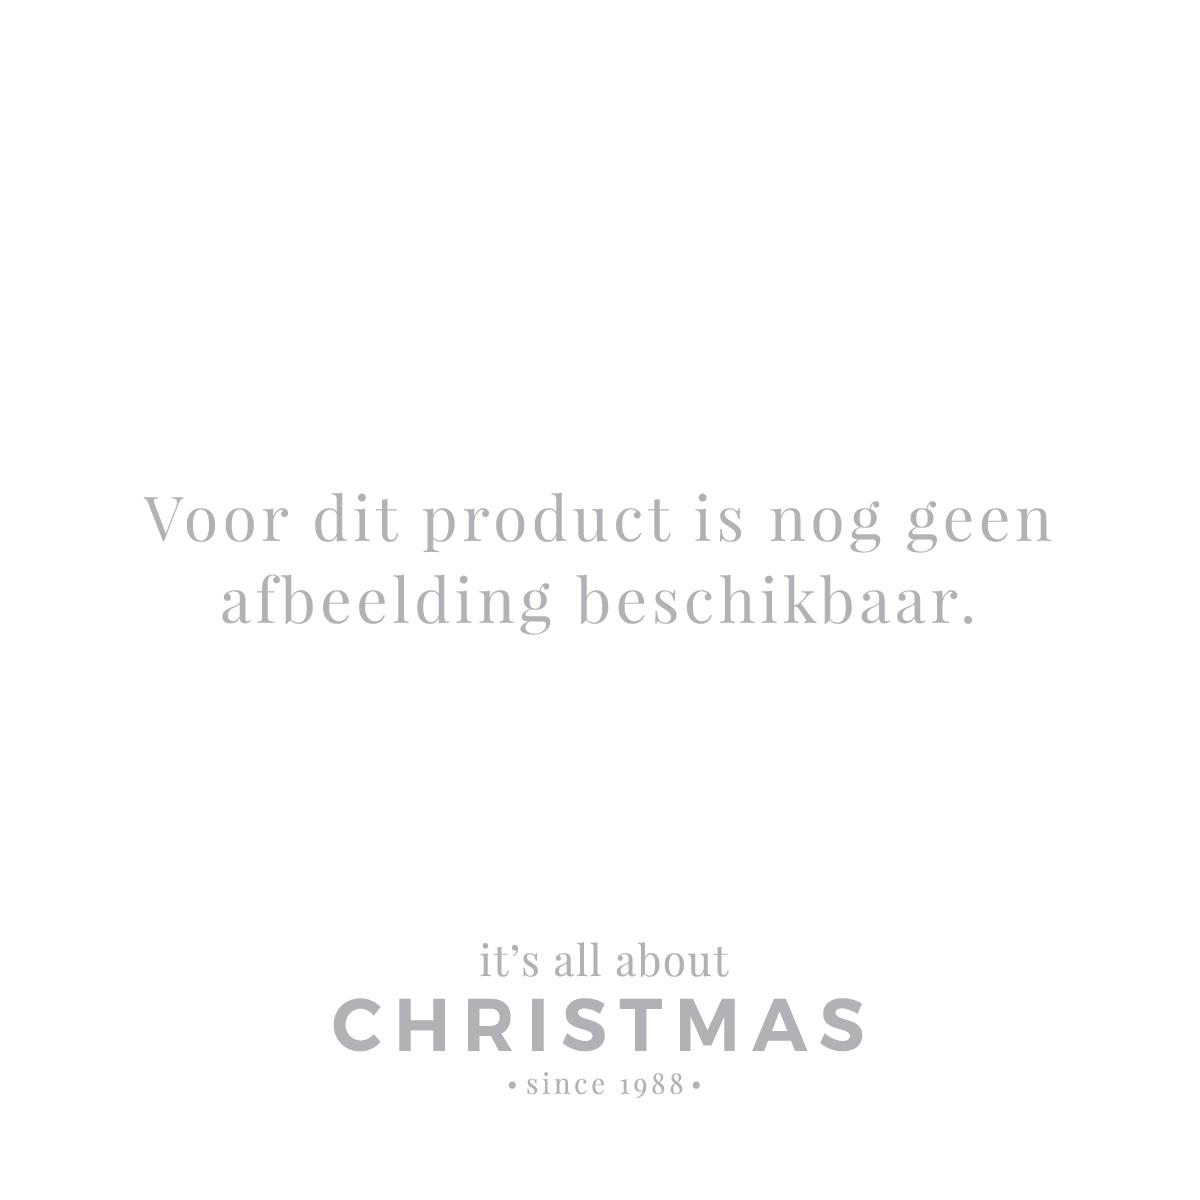 Christbaumkugeln Weiß.12 Kunststoff Christbaumkugeln Weiß Mix 7cm It S All About Christmas